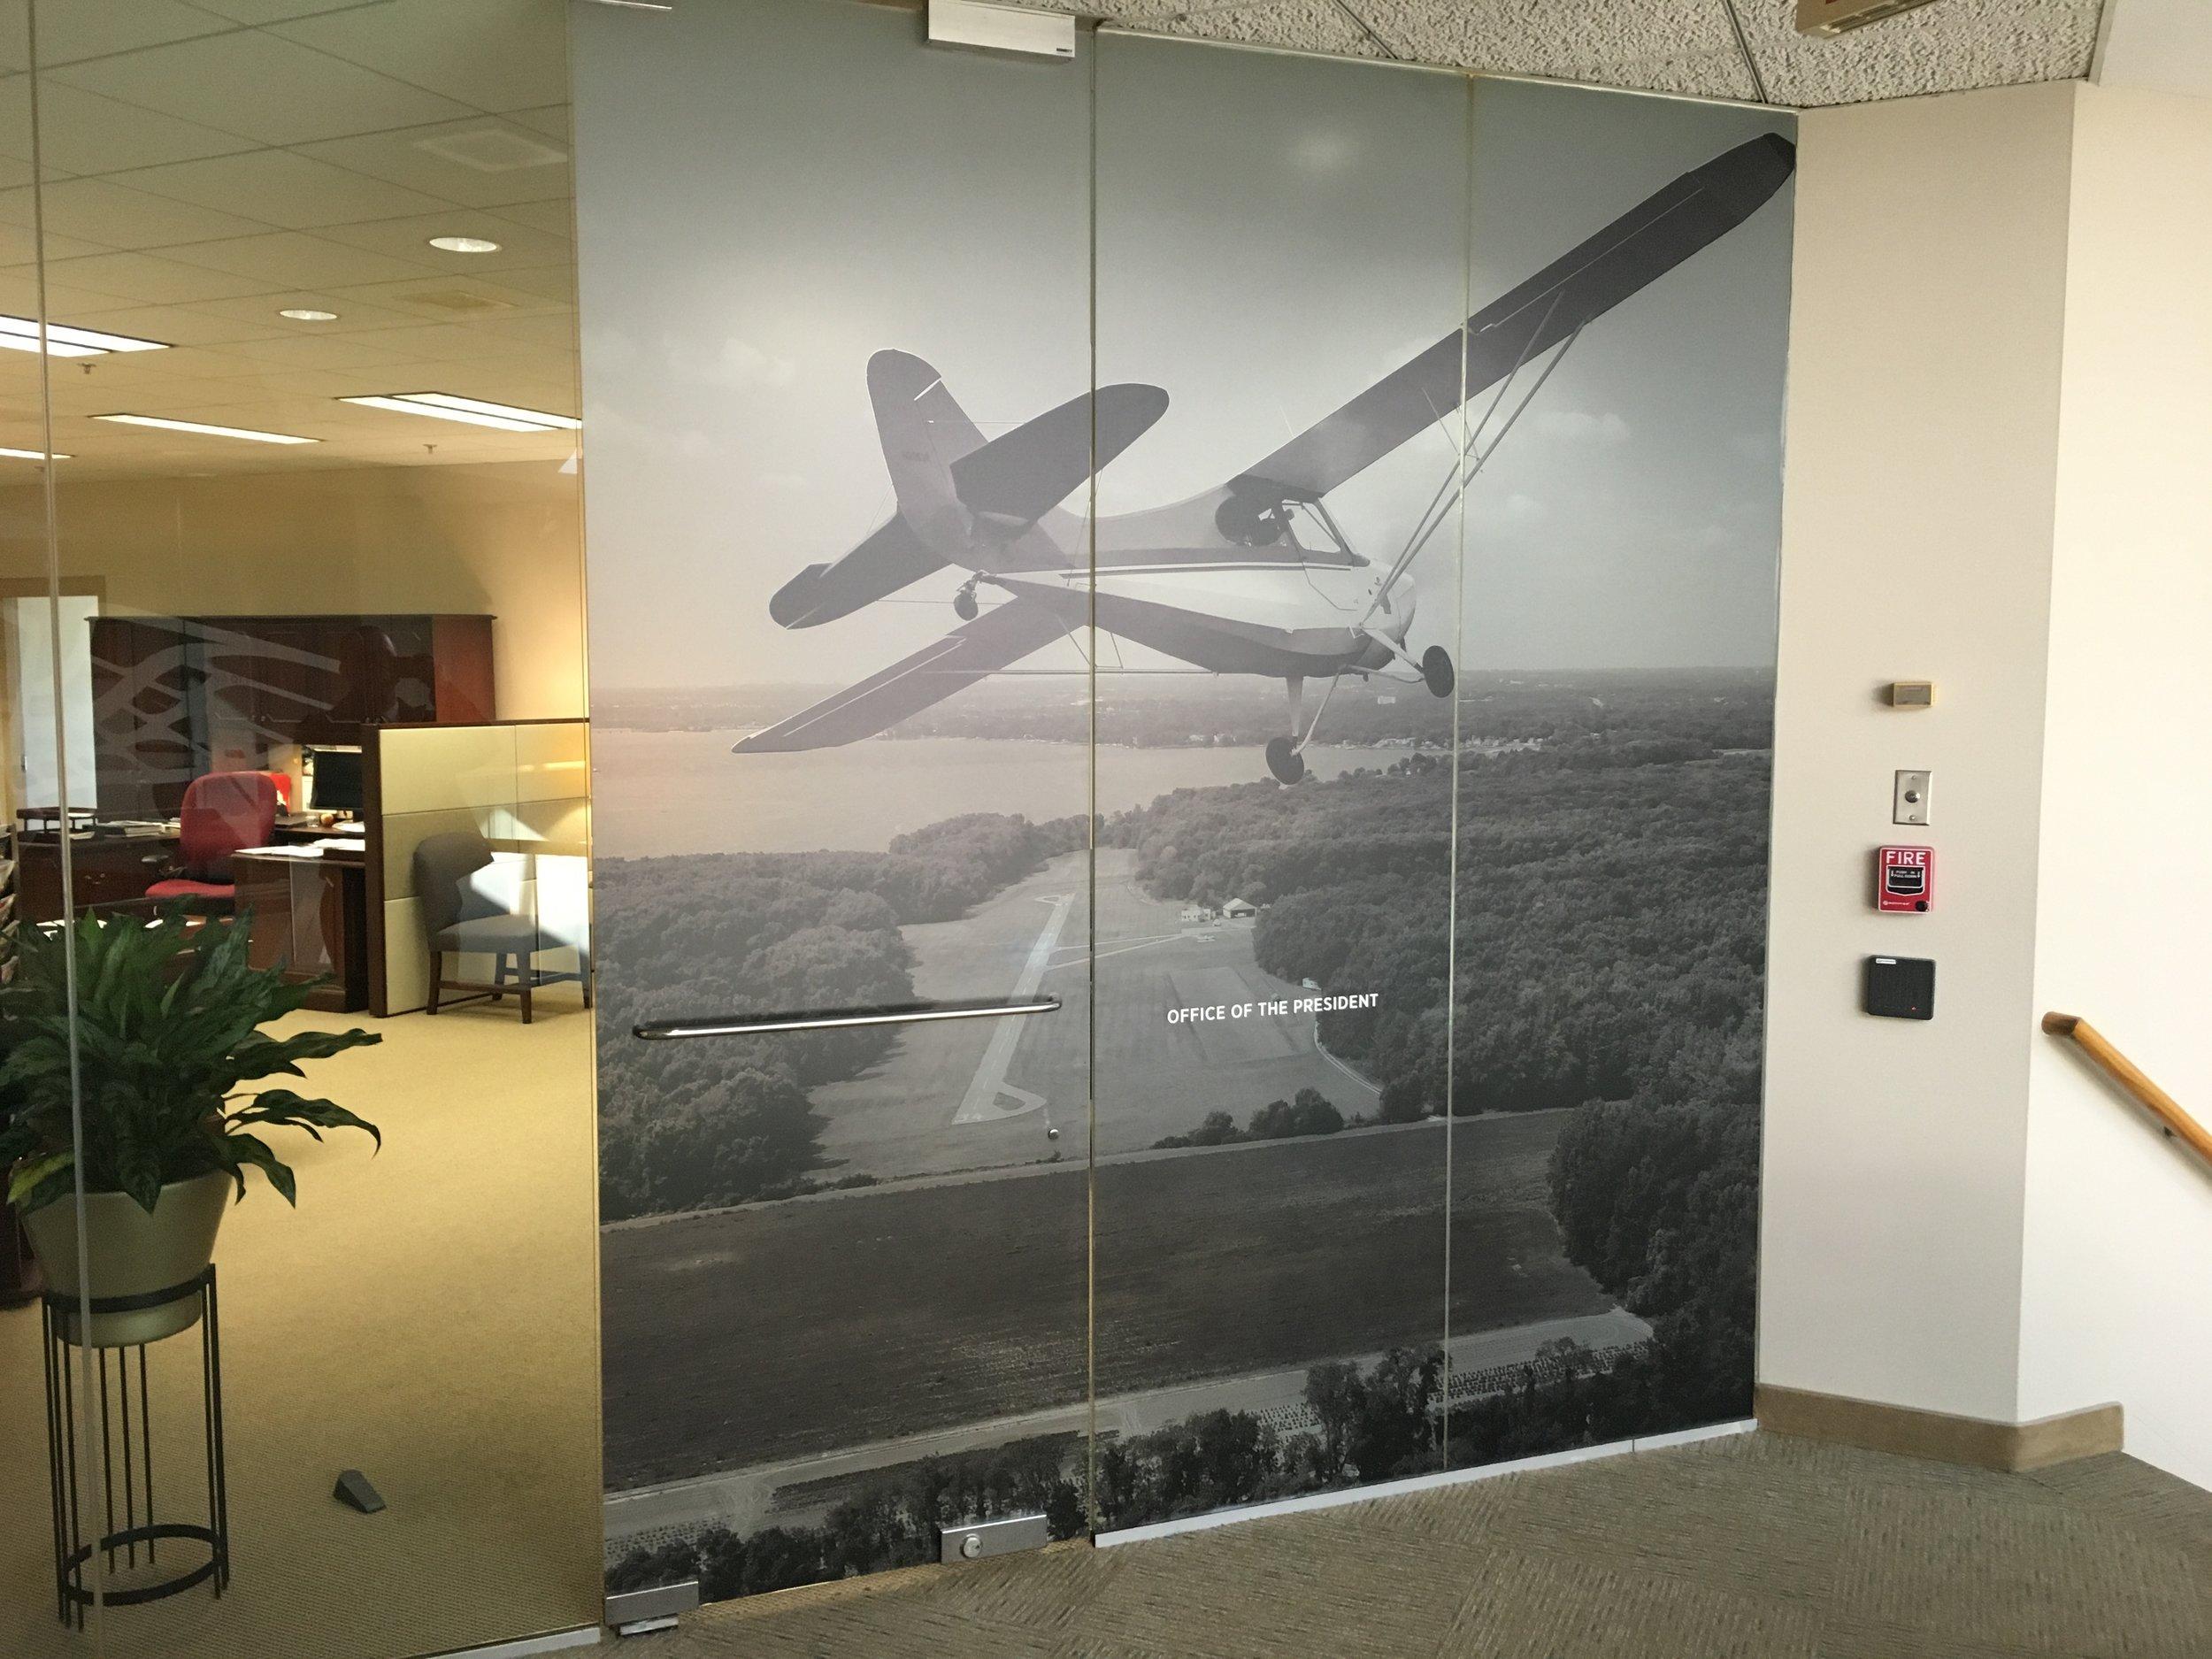 Airplane window graphics